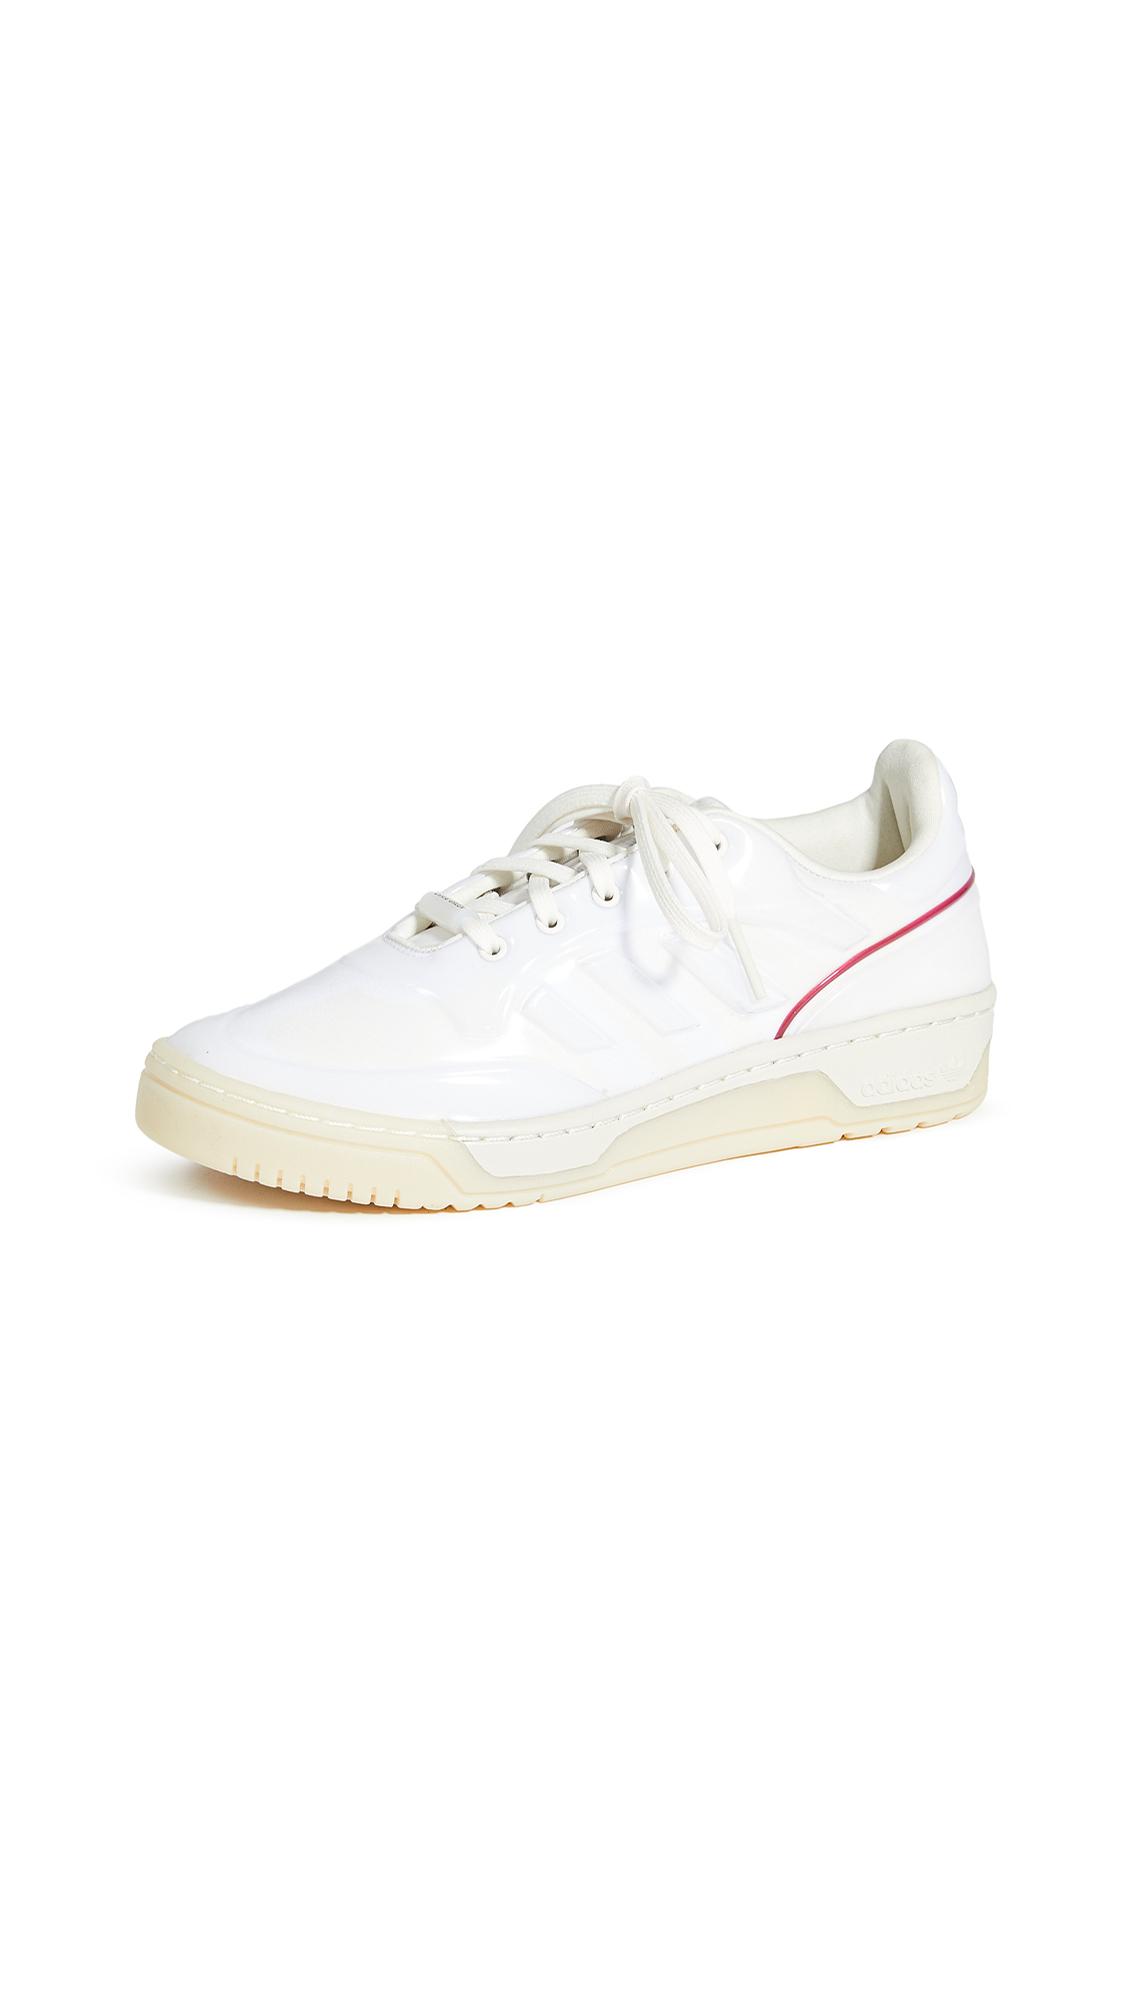 adidas x Craig Green Polta AKH III Sneakers